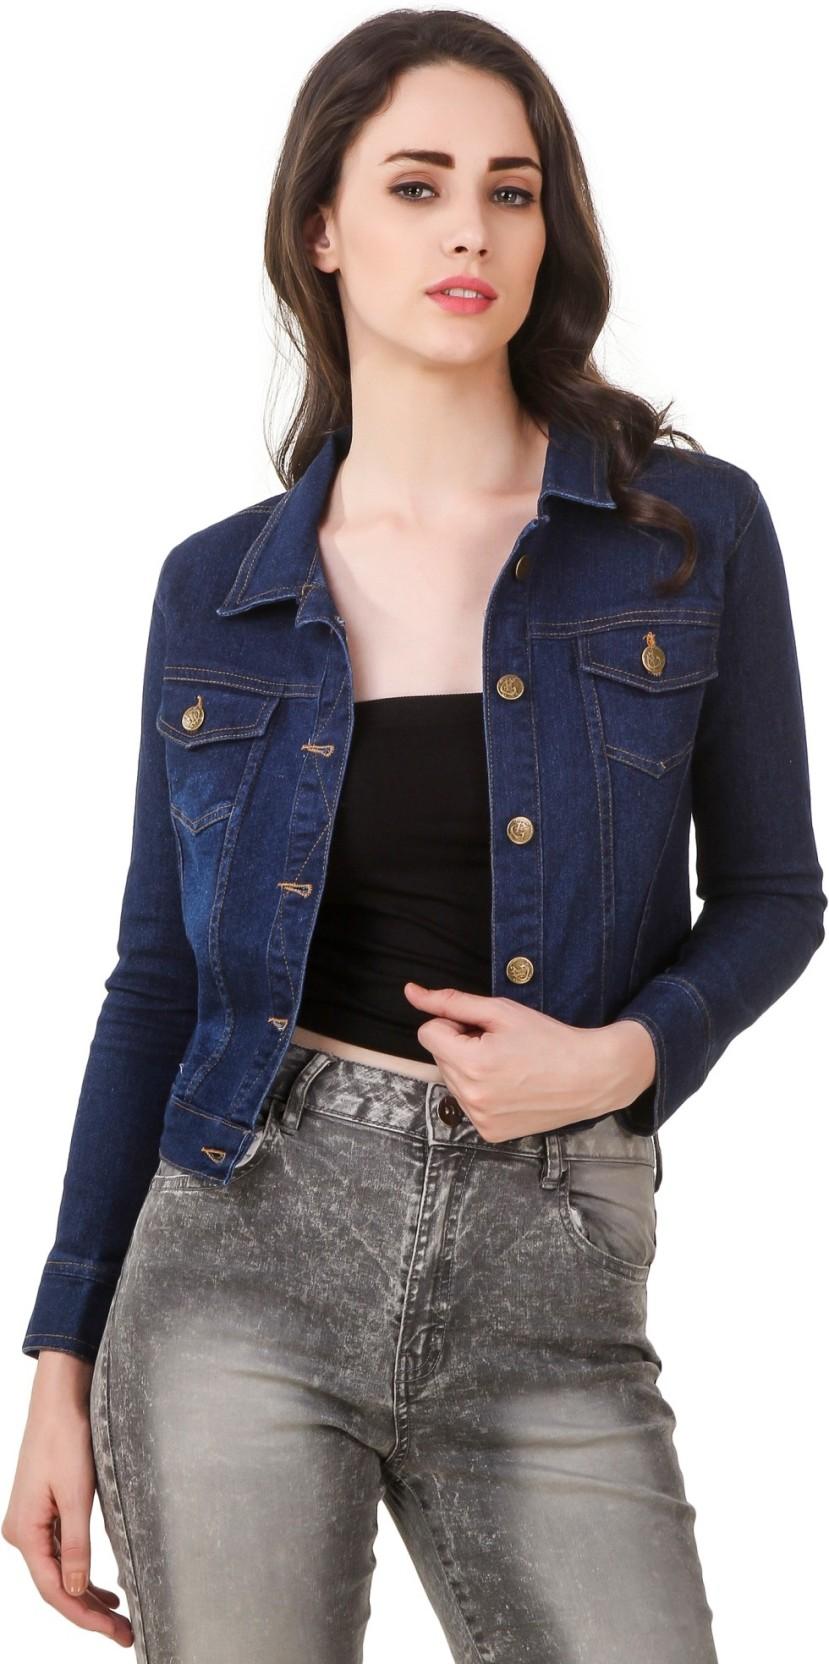 Clo Clu Full Sleeve Solid Women Denim Jacket - Buy Clo Clu Full Sleeve Solid Women Denim Jacket ...